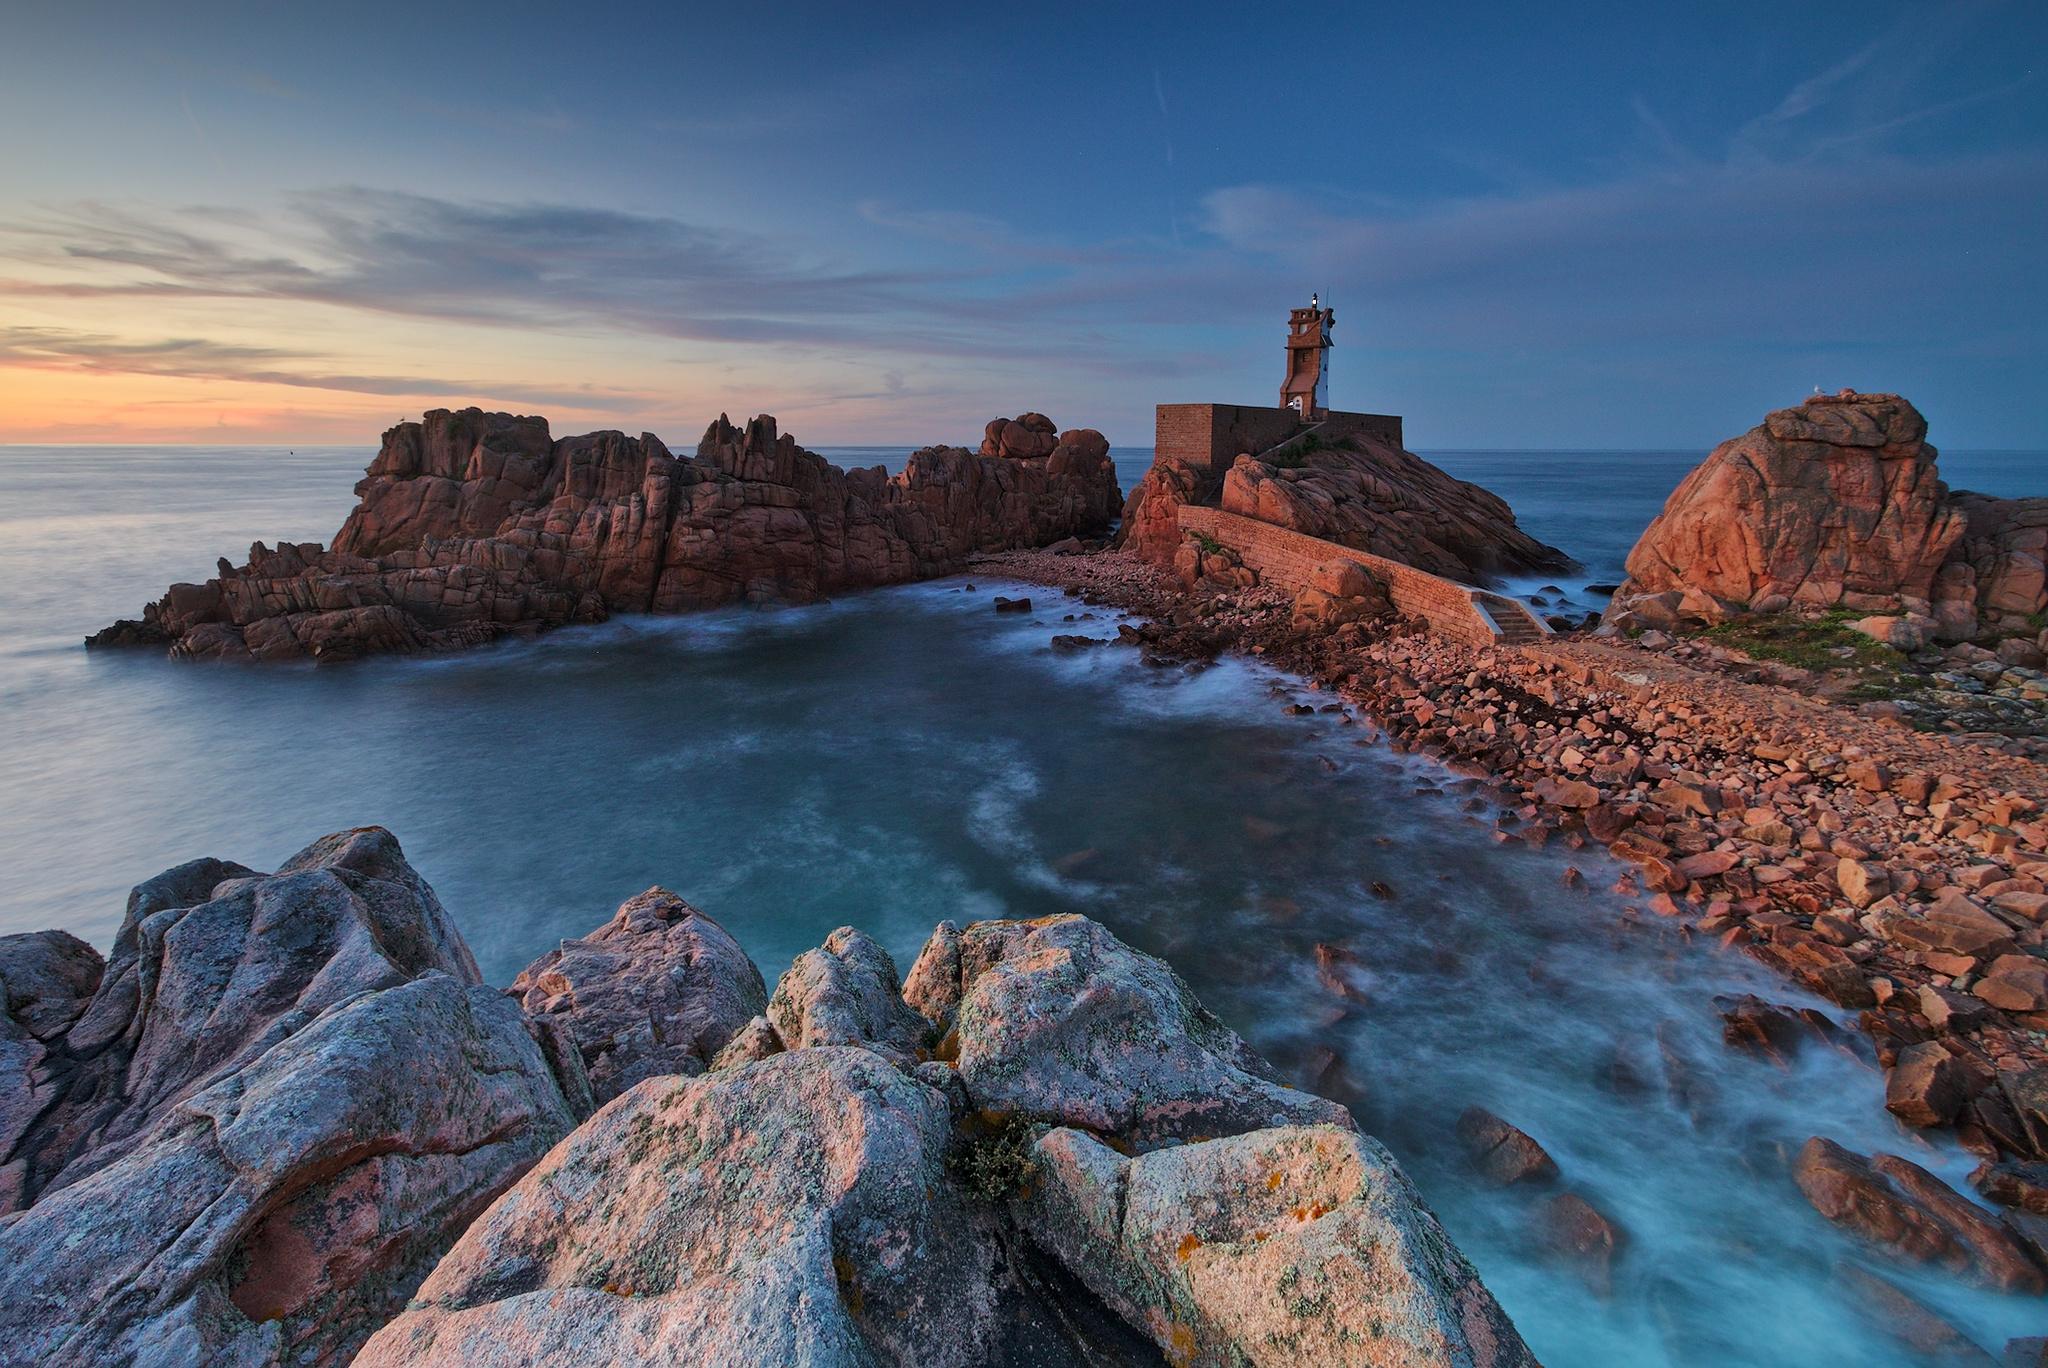 Paon Lighthouse, Brehat Island, France